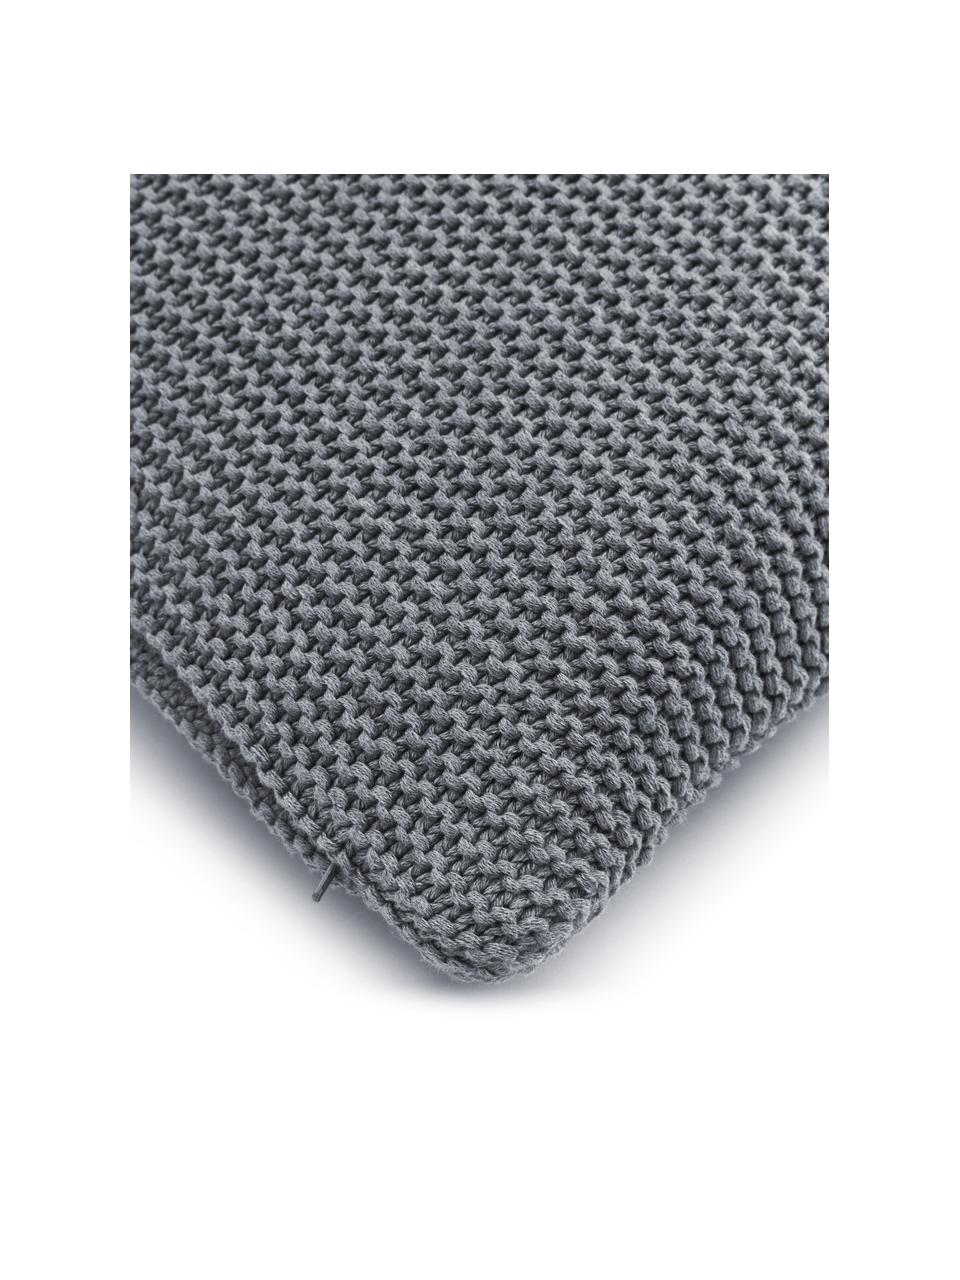 Strick-Kissenhülle Adalyn aus Bio-Baumwolle in Hellgrau, 100% Bio-Baumwolle, GOTS-zertifiziert, Hellgrau, 60 x 60 cm